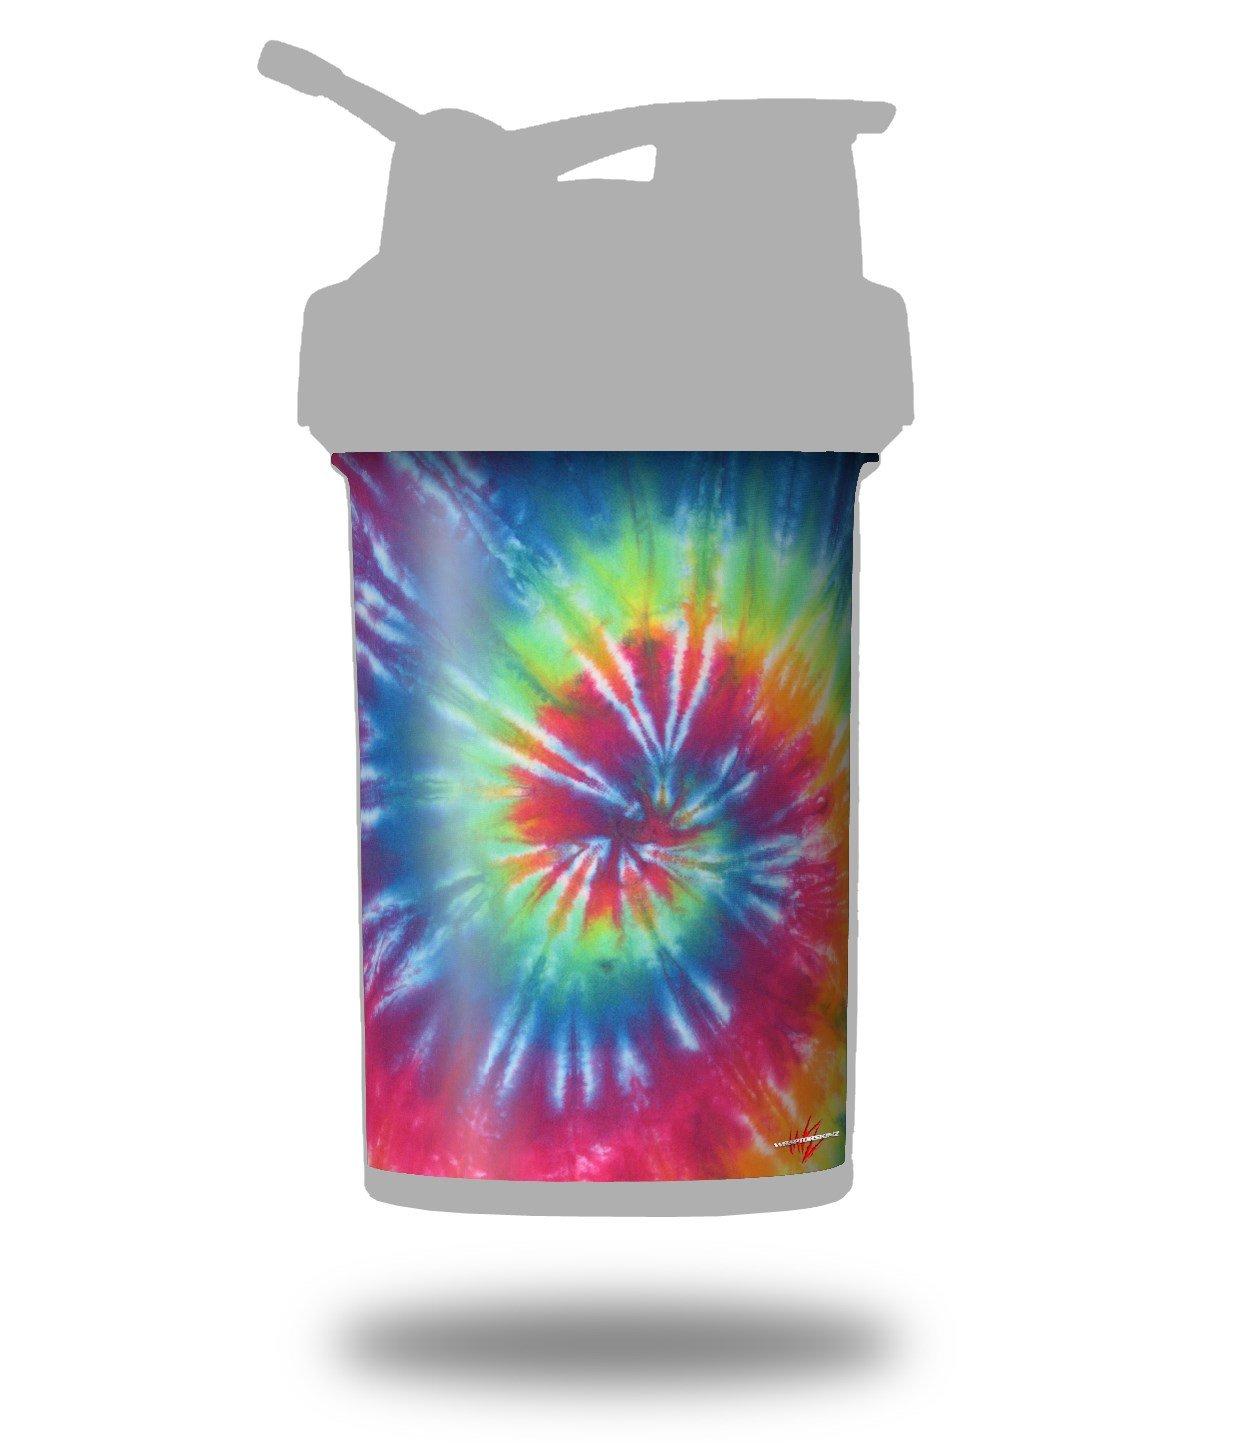 Tie Dye Swirl 104 – デカールスタイルスキンラップFits Blenderボトル22oz Prostak (ボトルは含まれません B06WRWDD2V